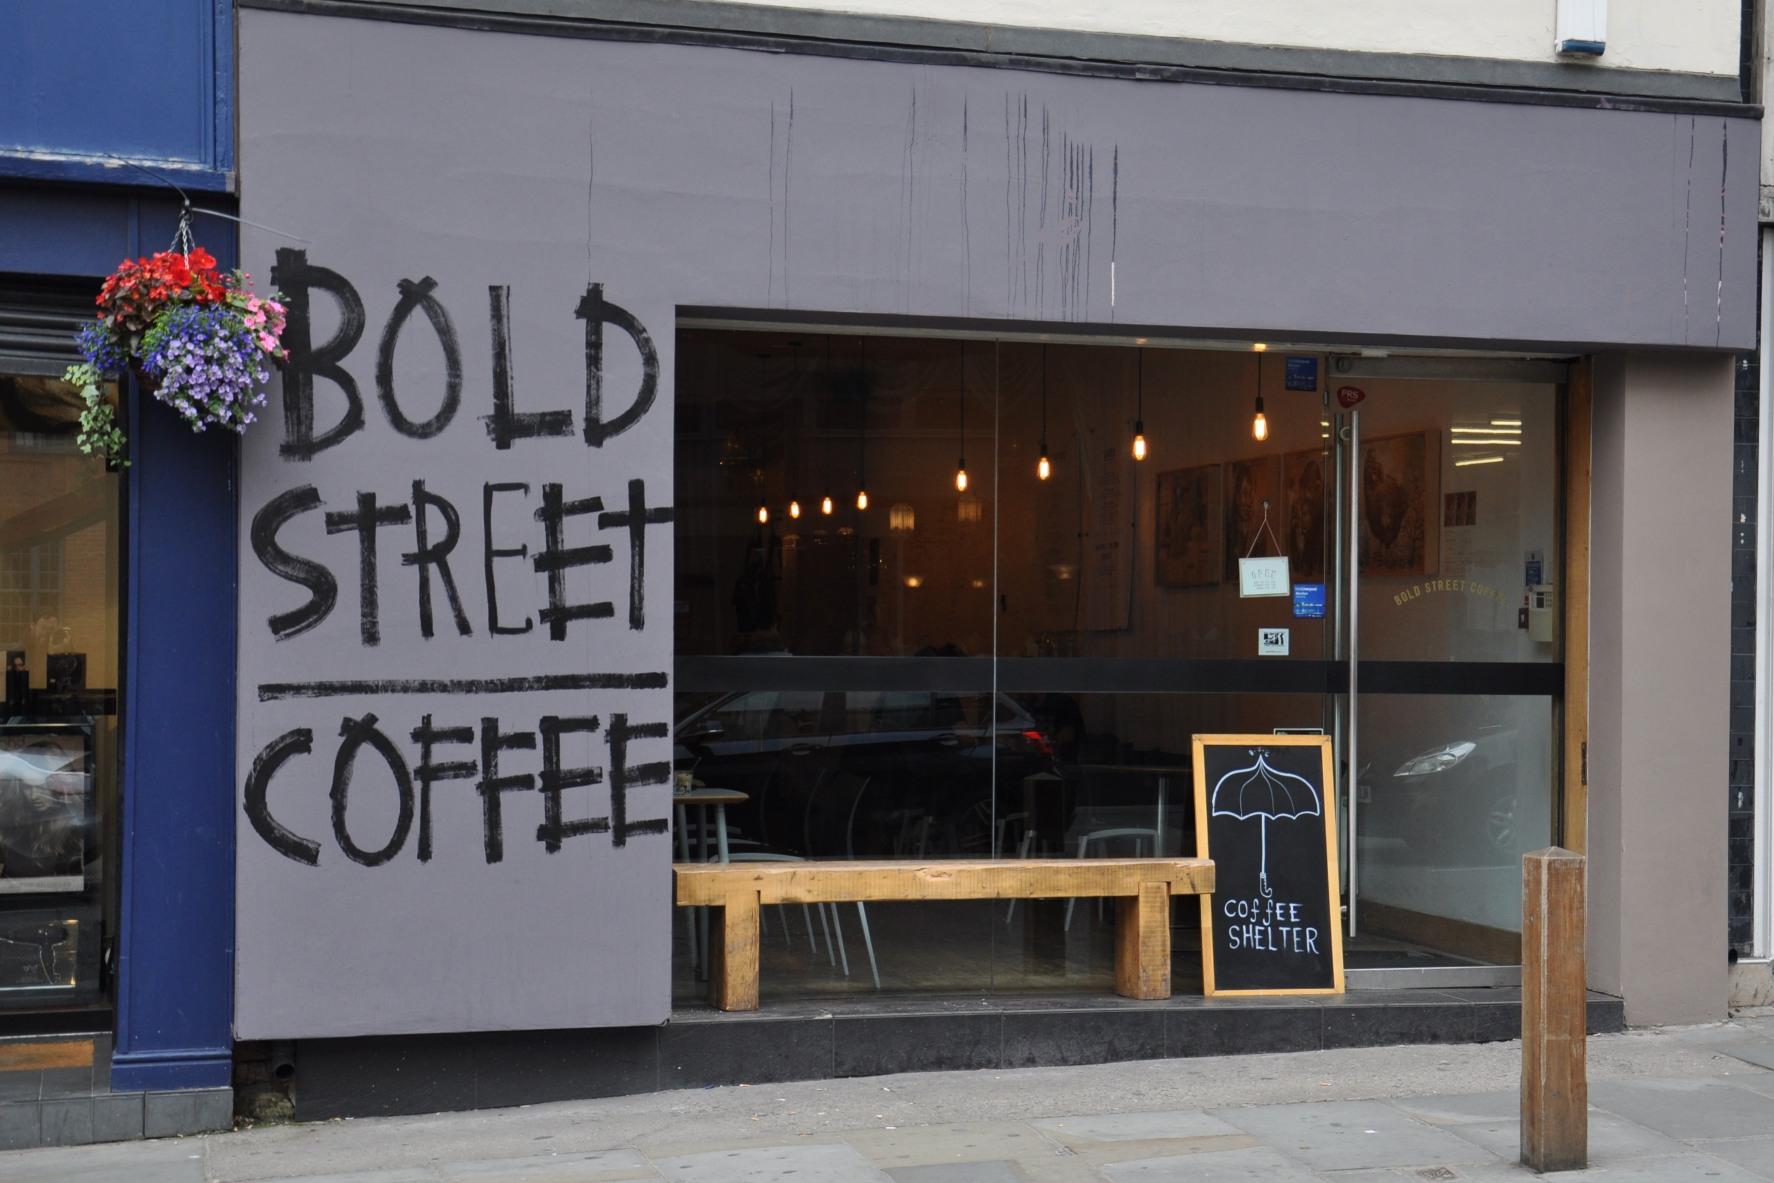 Thumbnail Bold Street Coffee Dsc 6551 Brian S Coffee